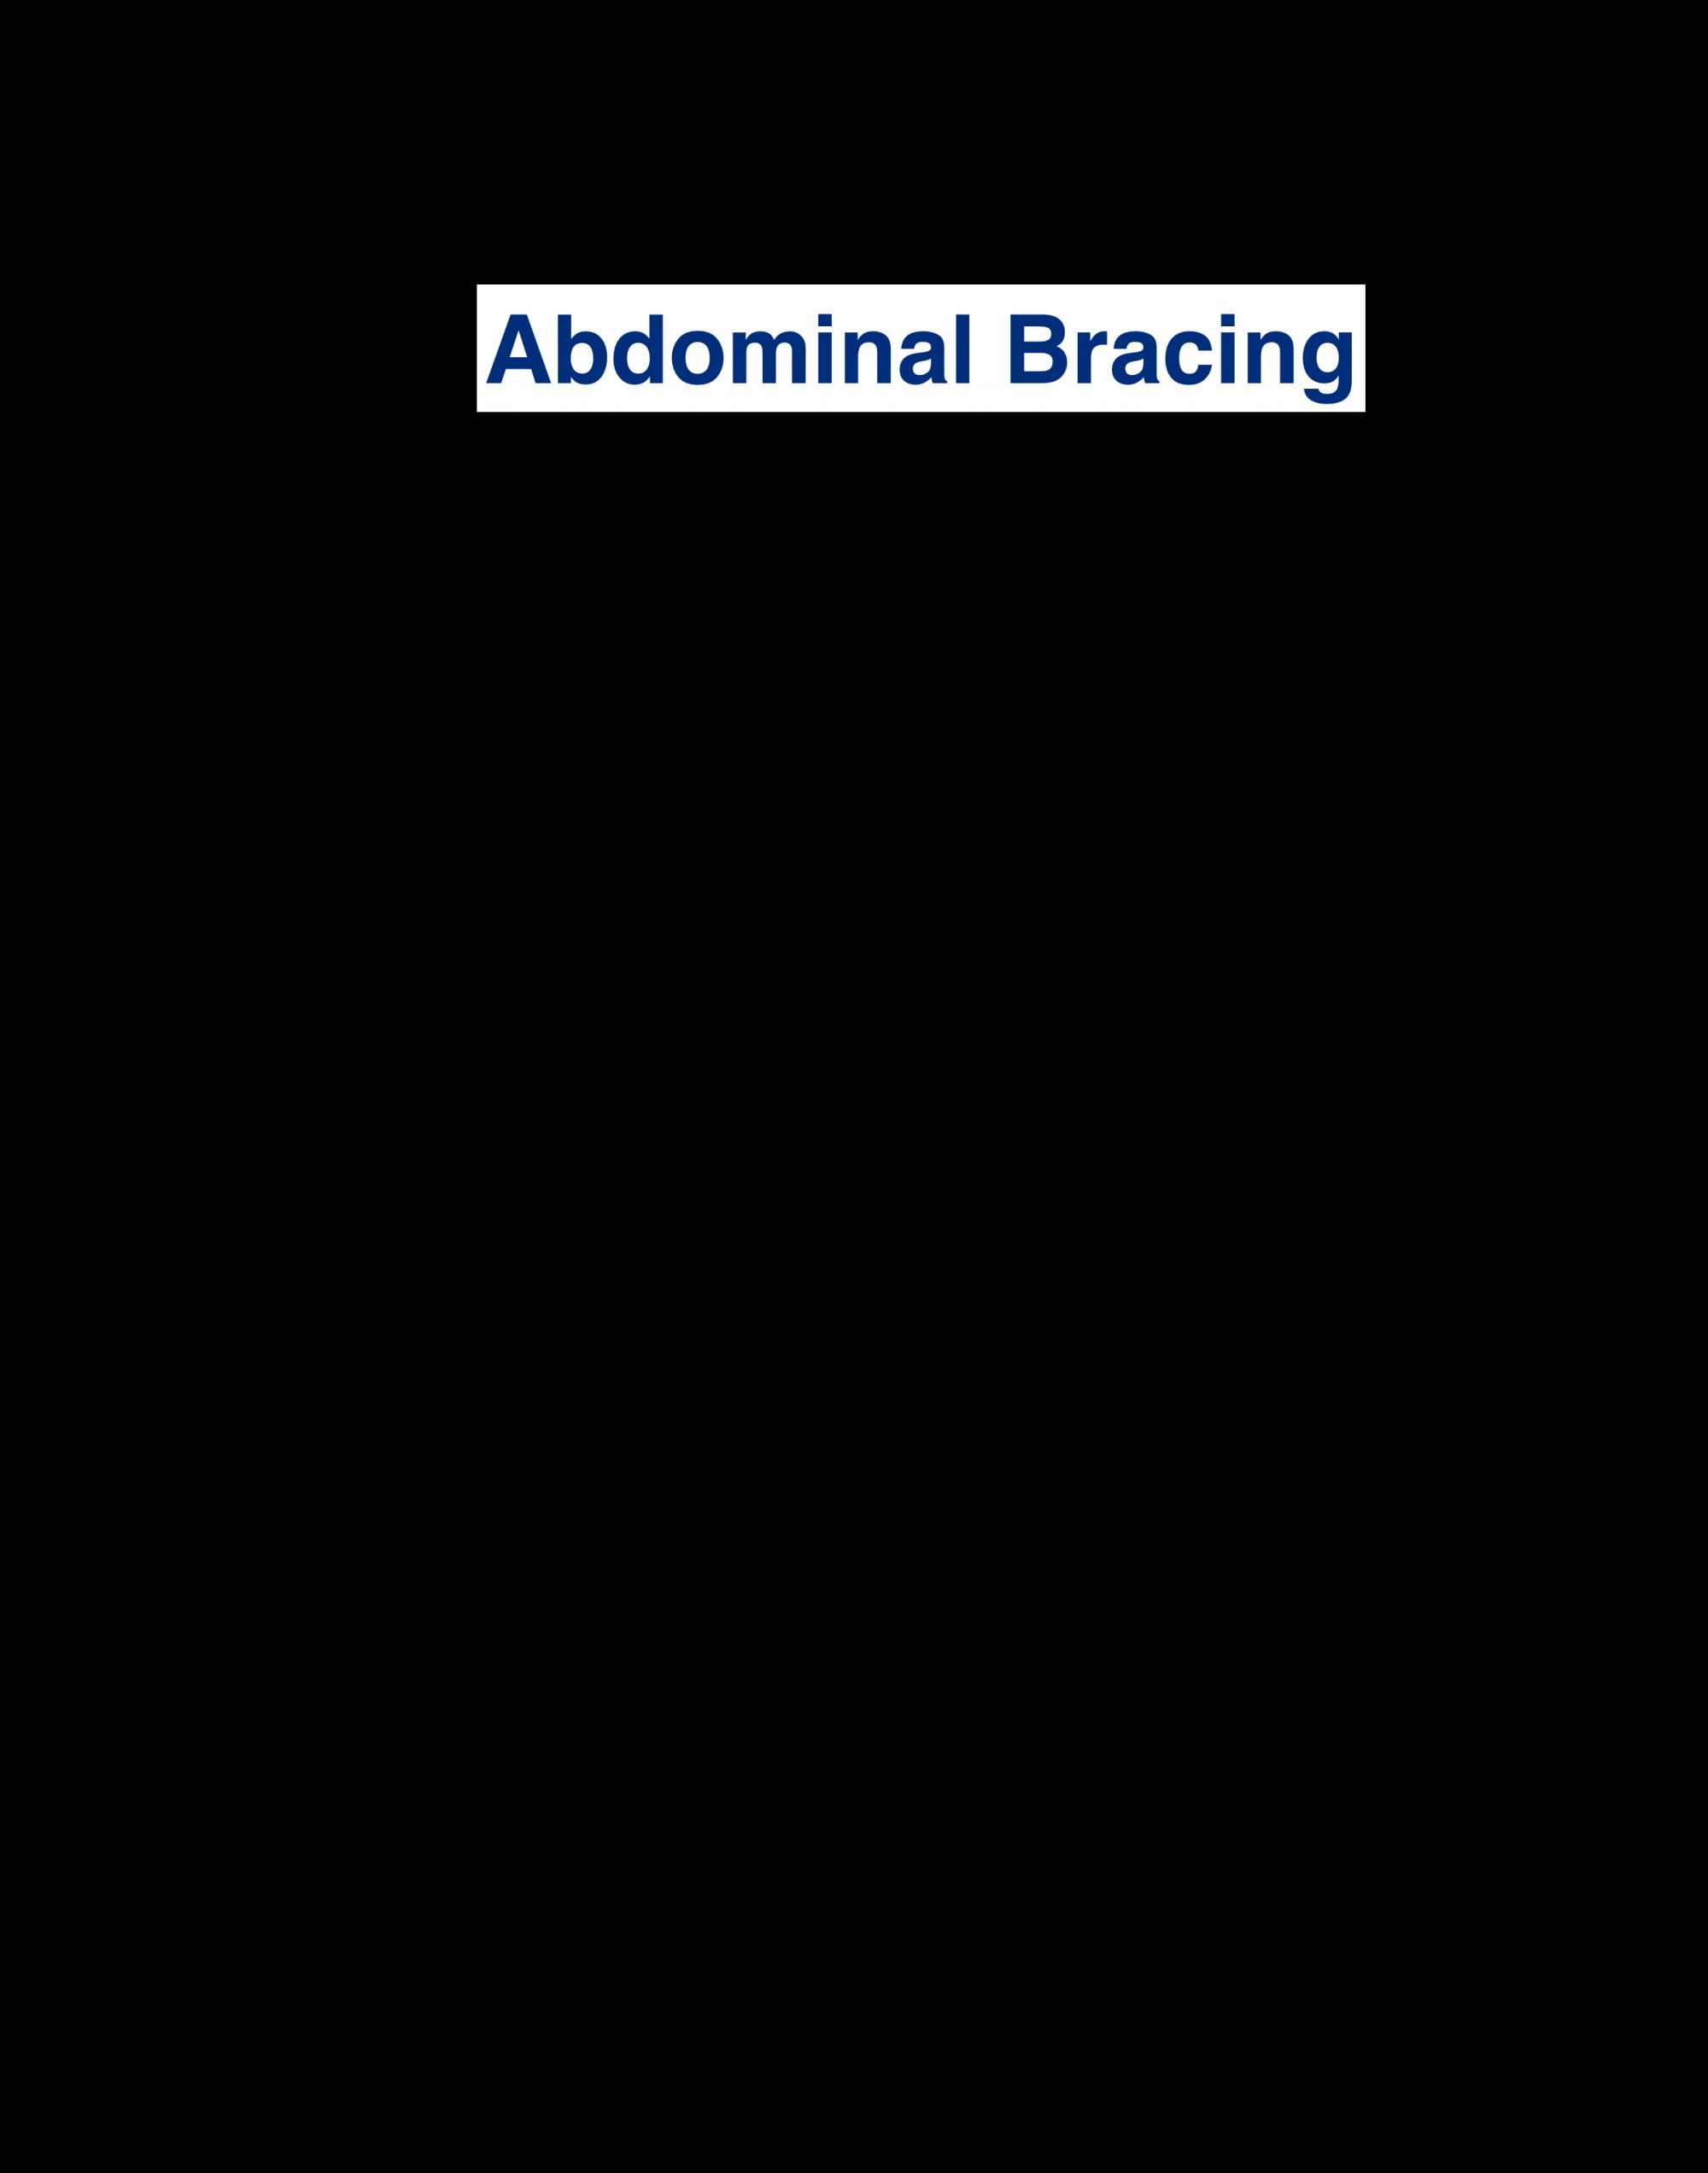 Abdominal Bracing